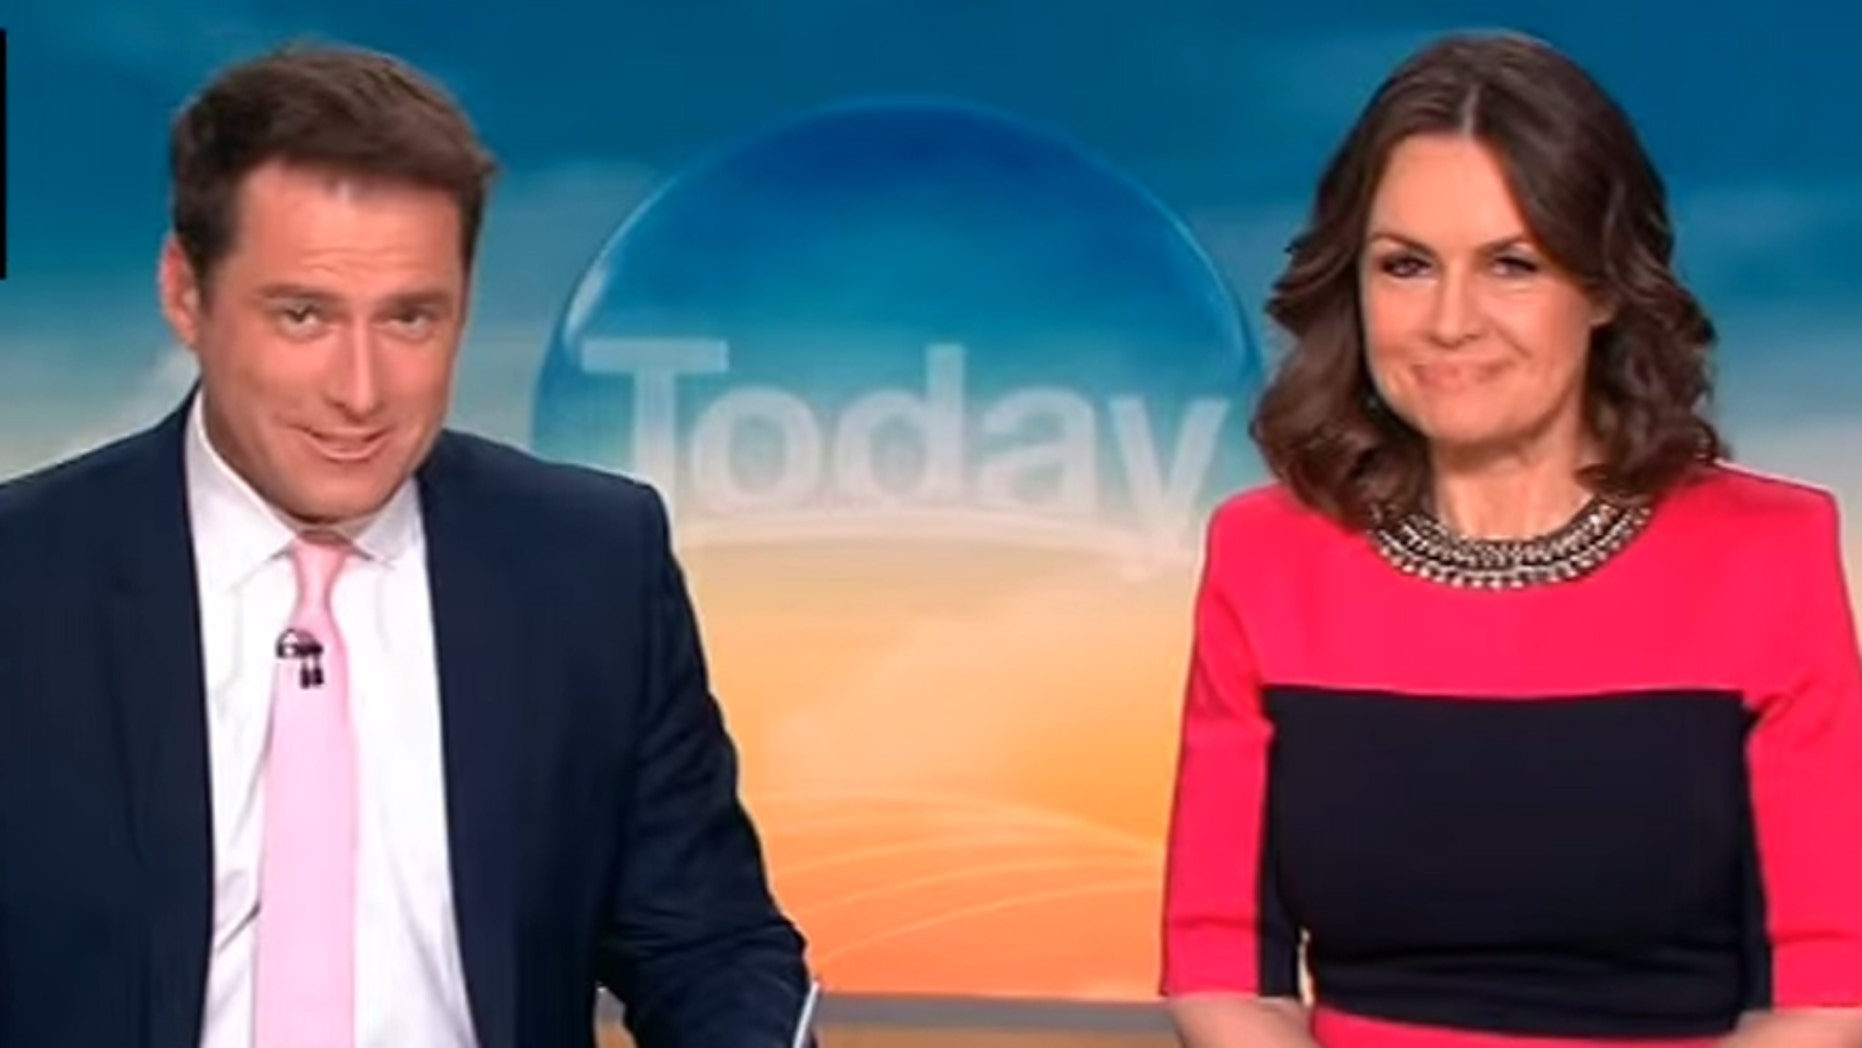 Karl Stefanovic wears his suit on 'Today' Australia.